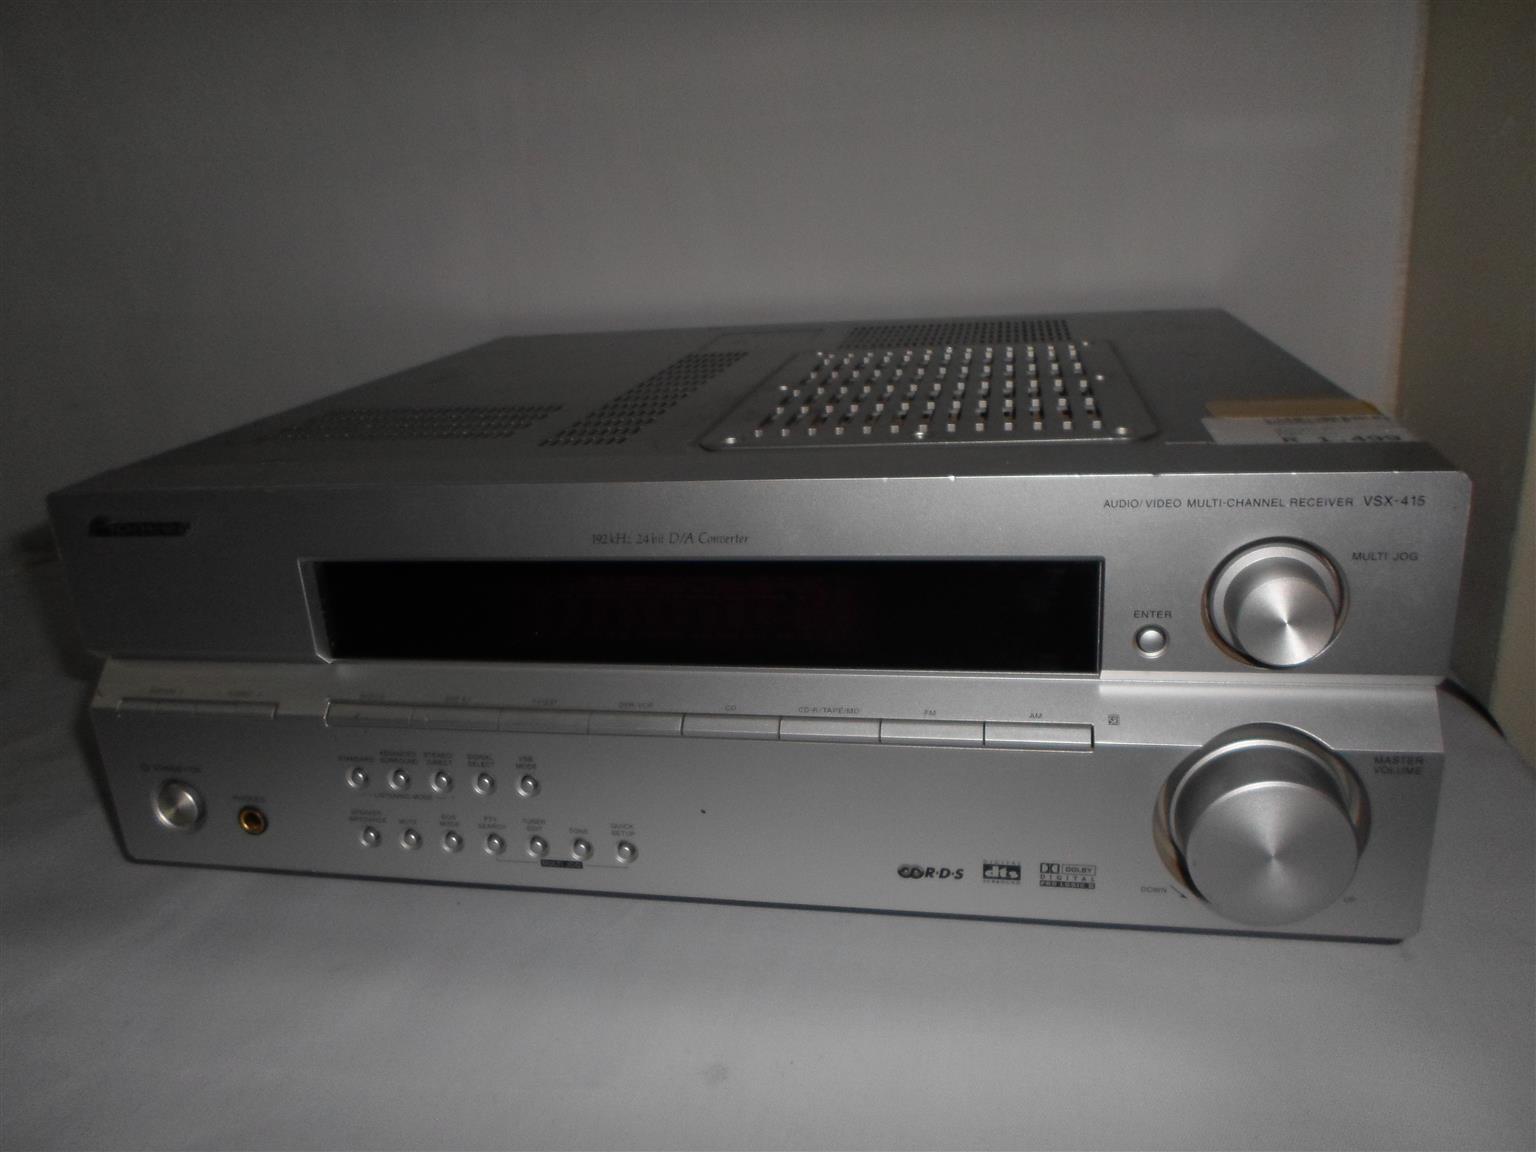 Pioneer VSX-415-S Multi Channel Receiver